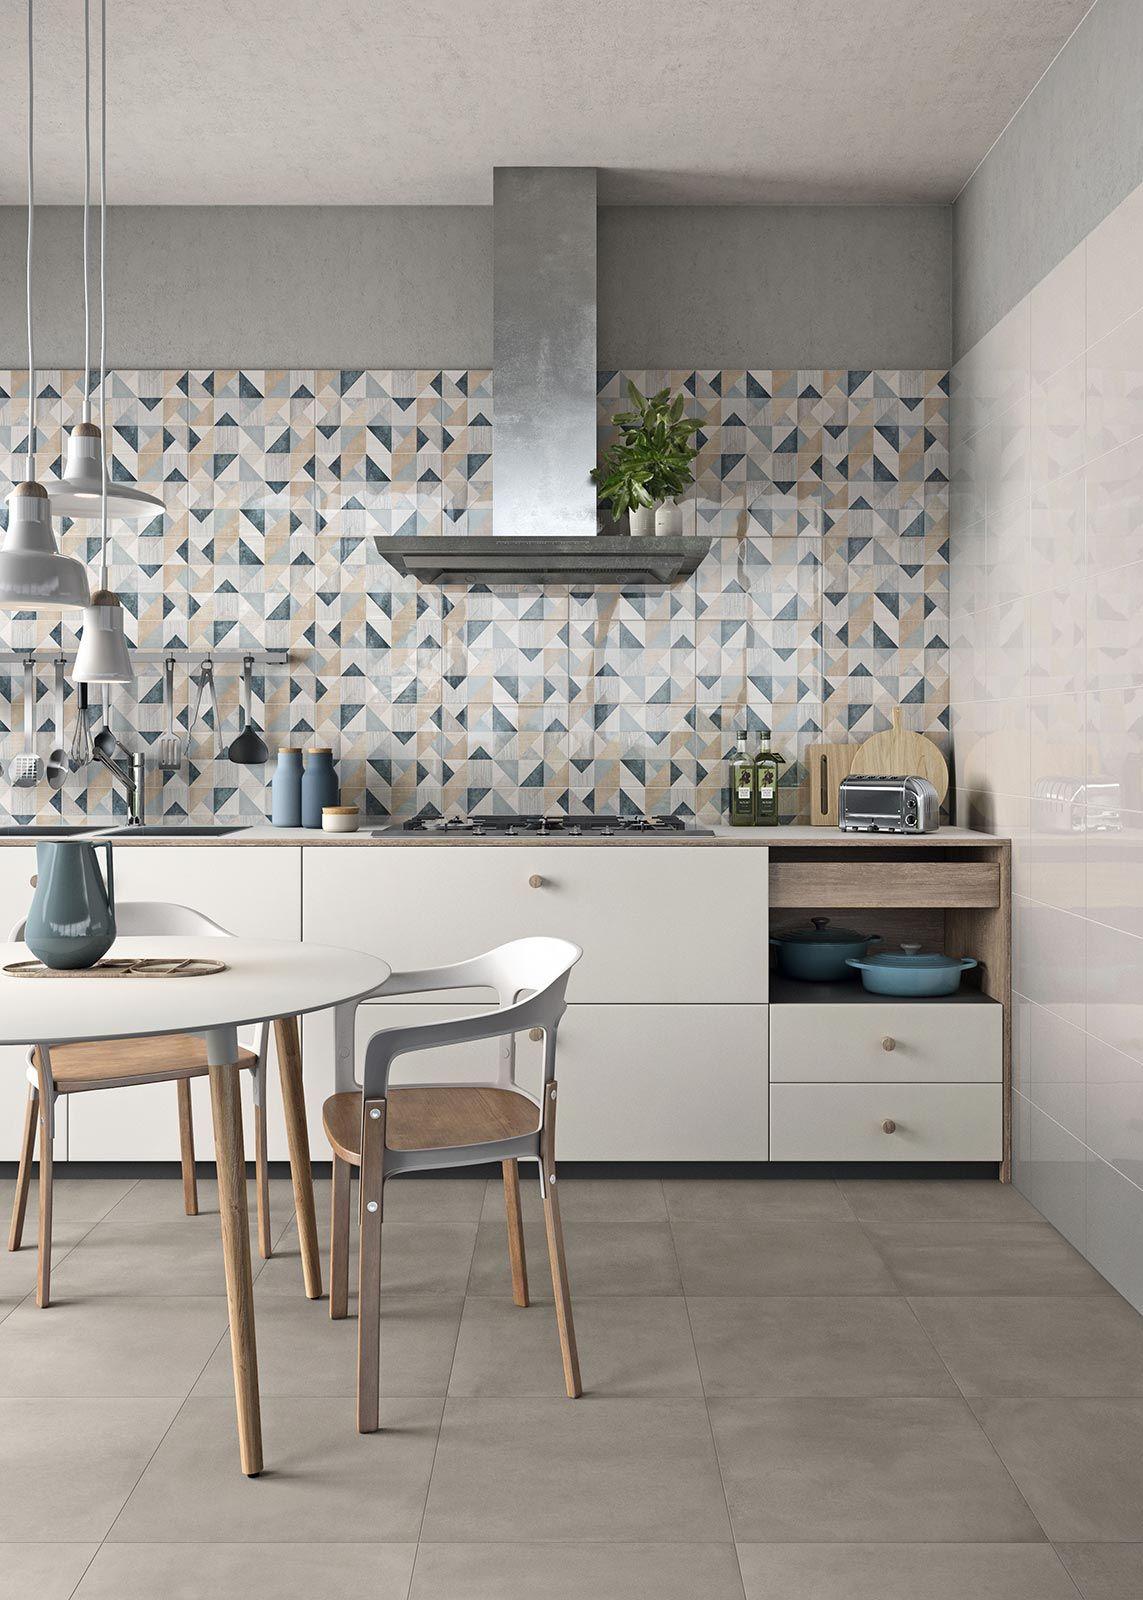 piastrelle cucina: idee e soluzioni in ceramica e gres - marazzi ... - Ceramica Cucina